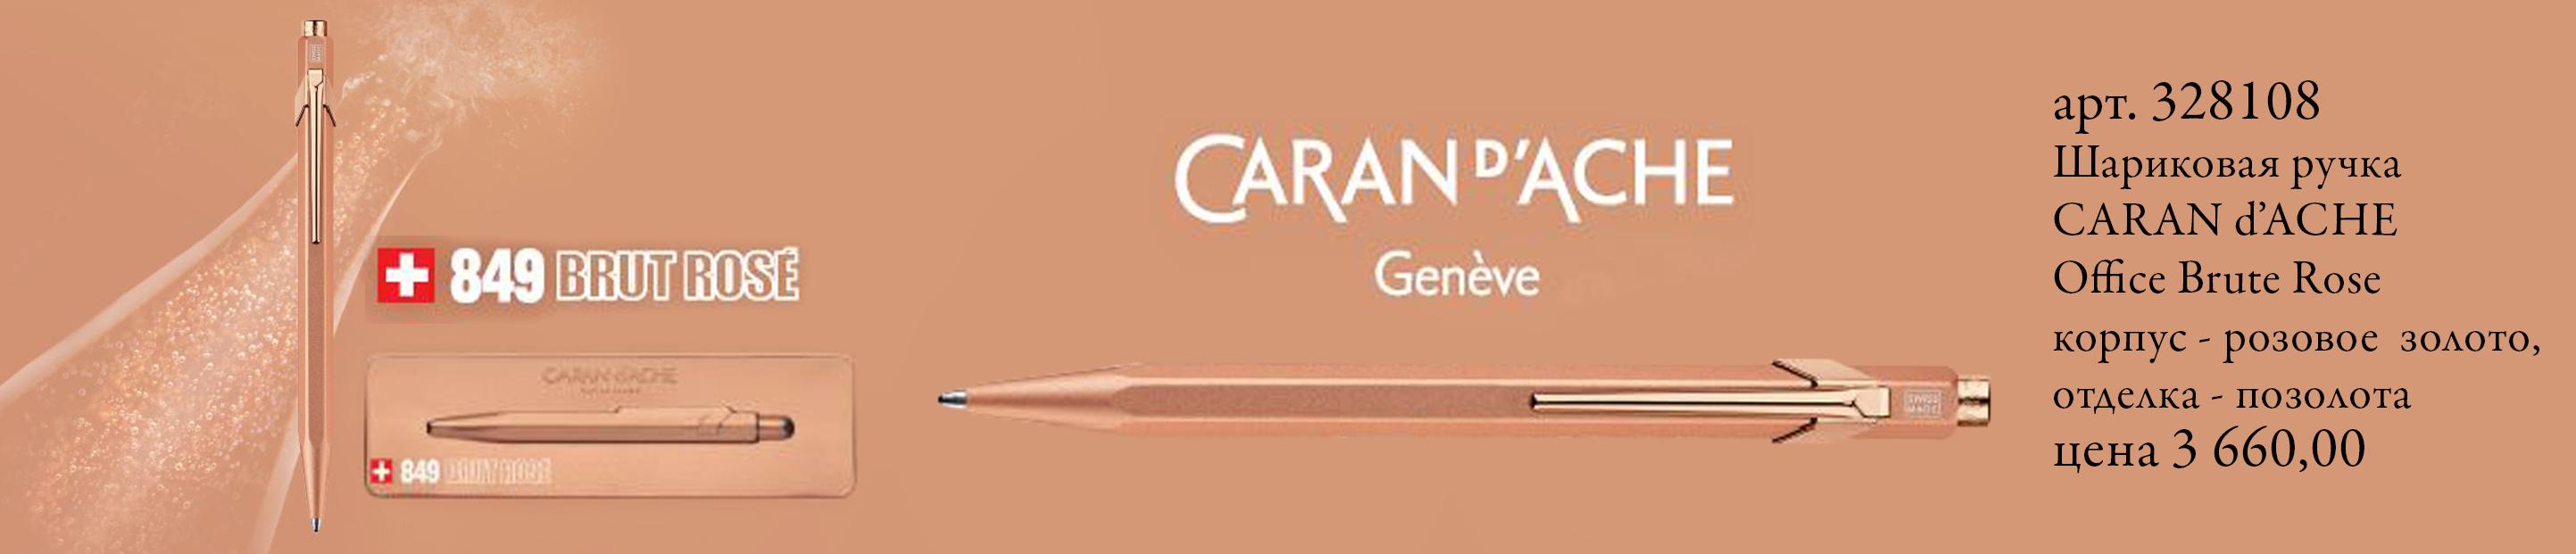 Элегантная шариковая ручка CARAN d'ACHE Office Brute Rose